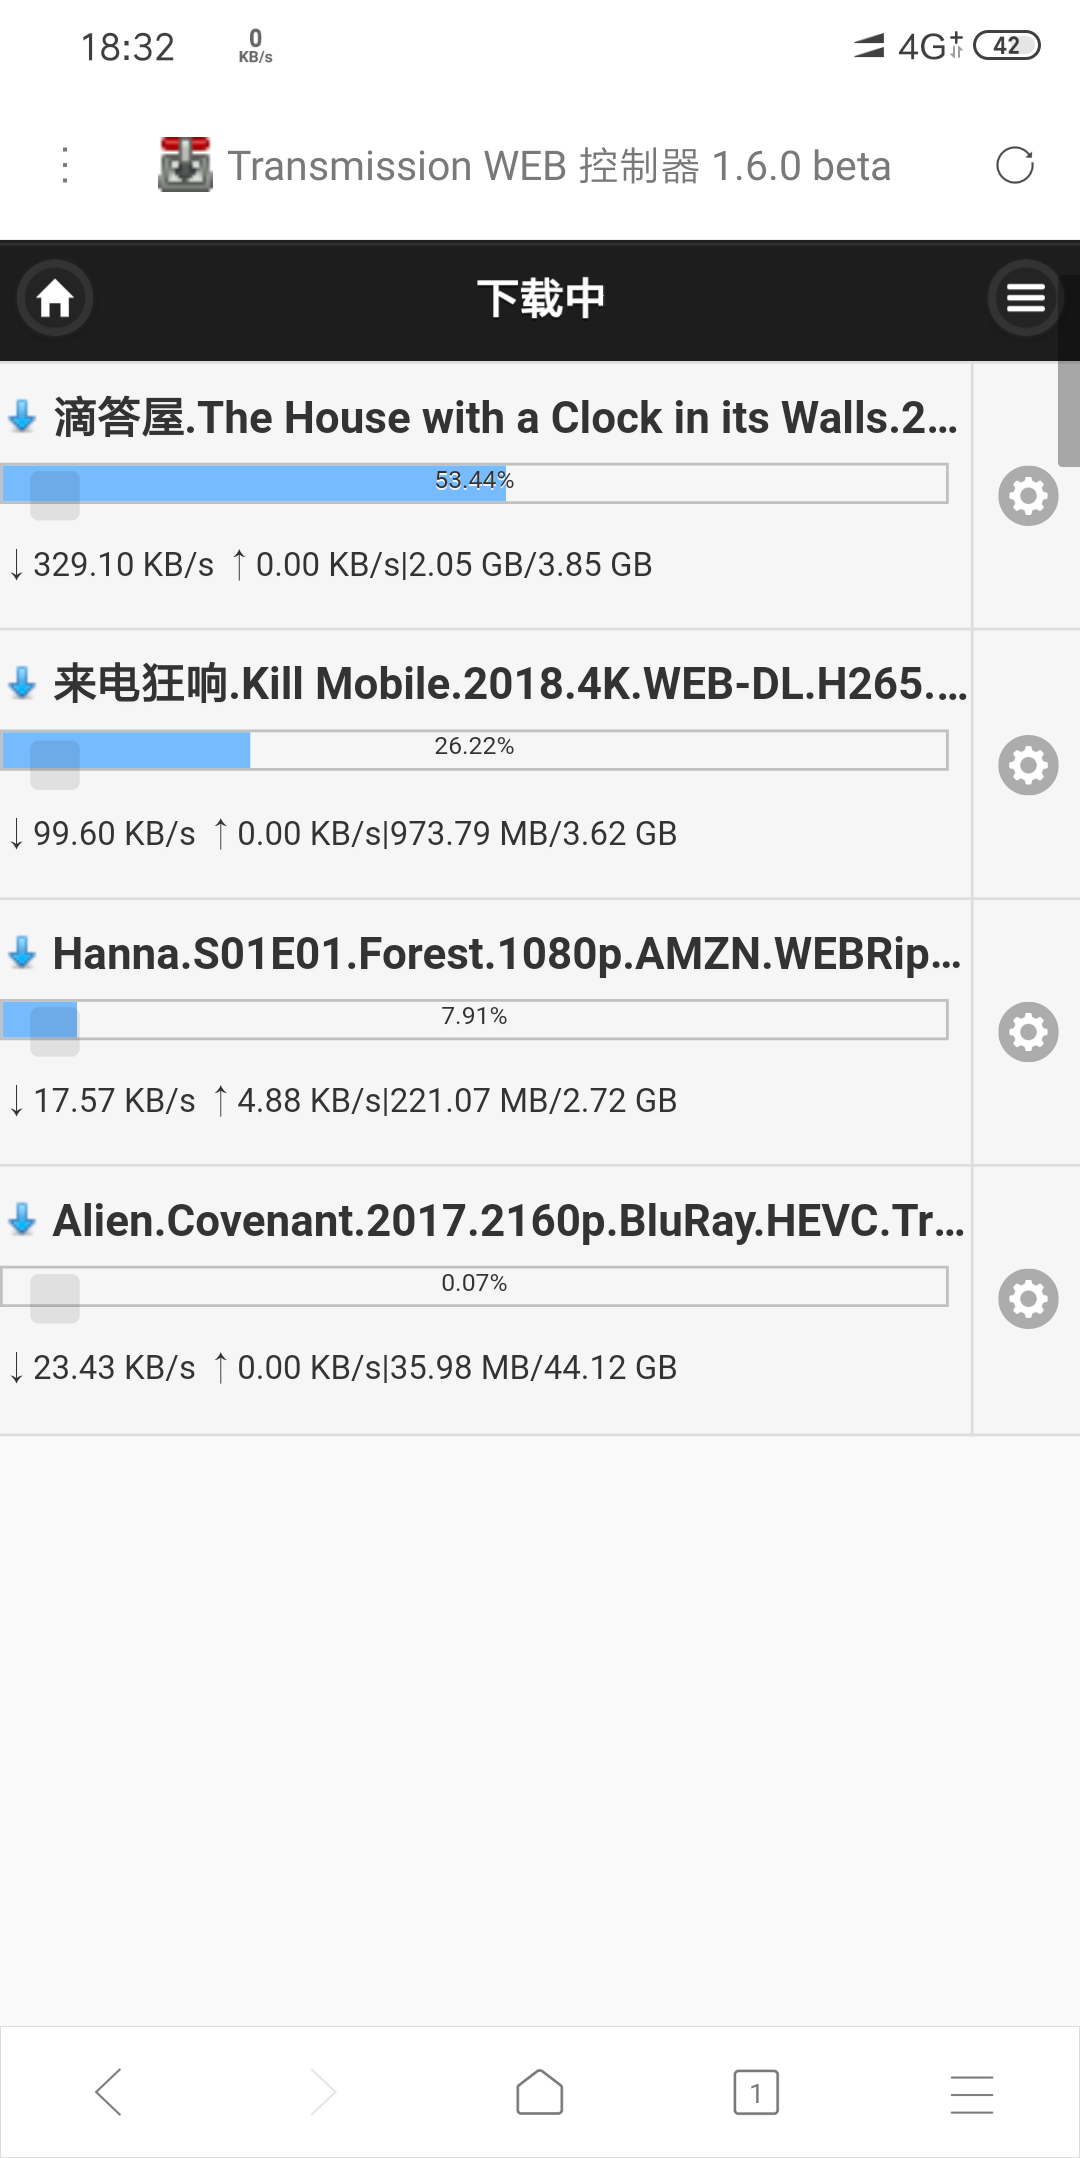 Screenshot_2019-02-09-18-32-35-661_com.xbrowser.p.png